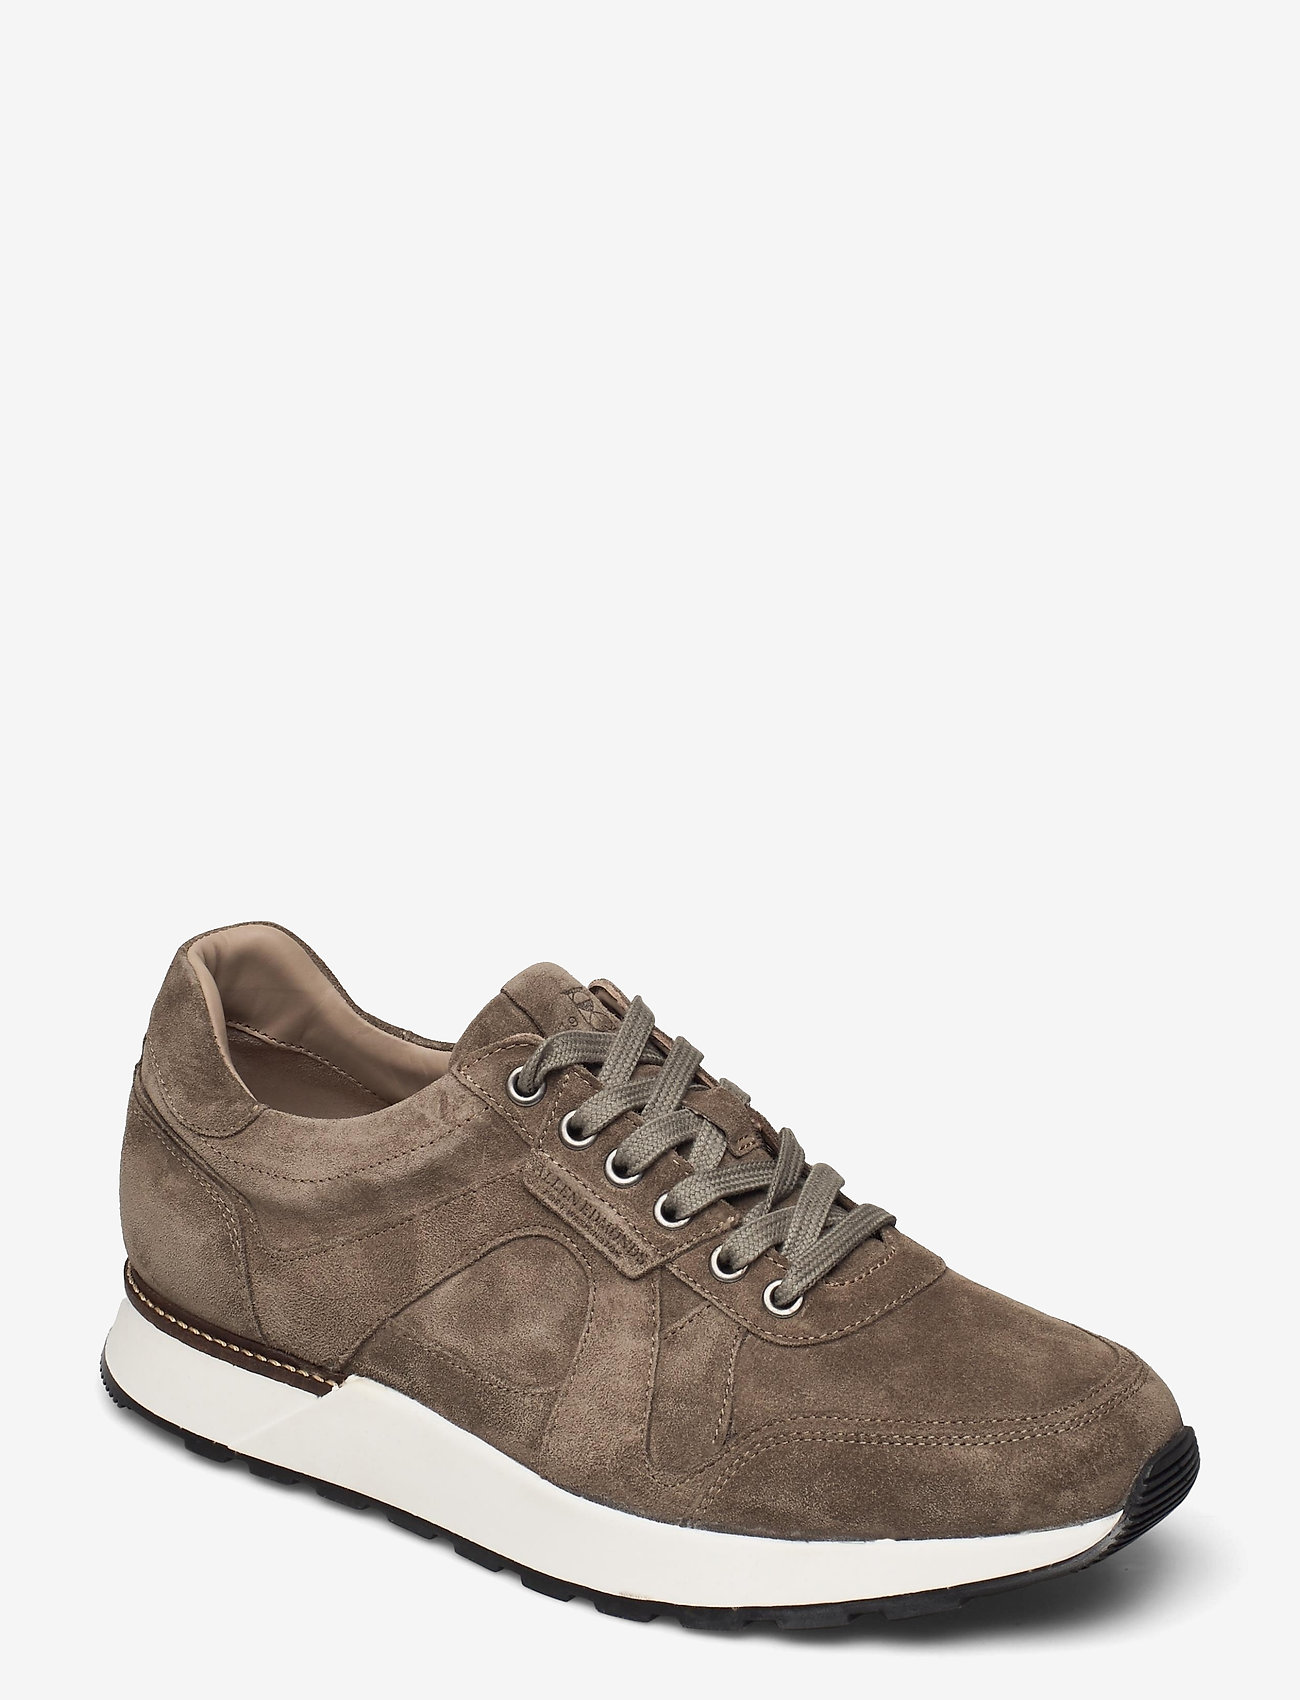 Allen Edmonds - A-Trainer - låga sneakers - grey - 1